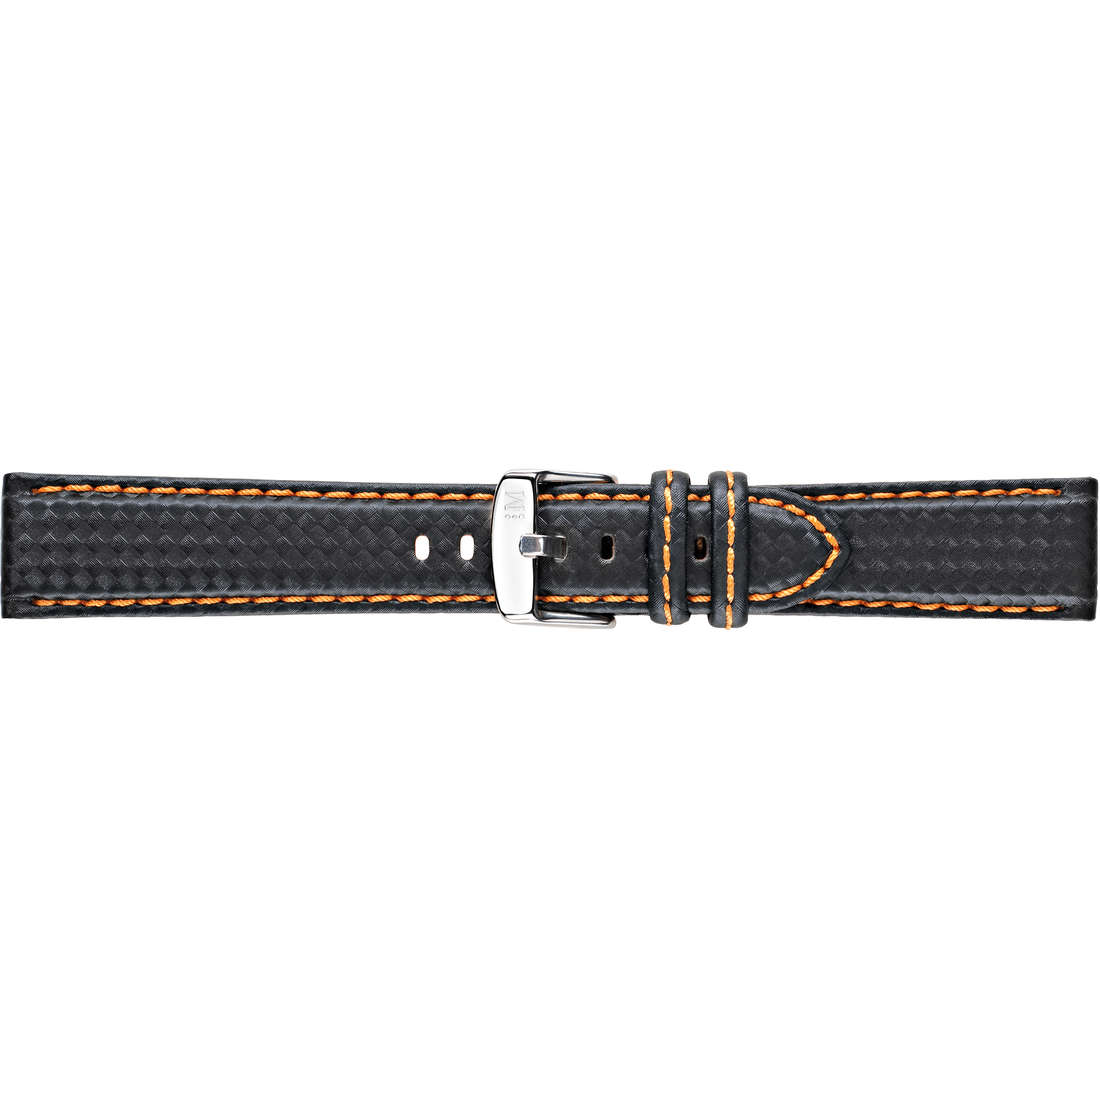 montre bande de montres homme Morellato Linea Sport A01U3586977886CR24